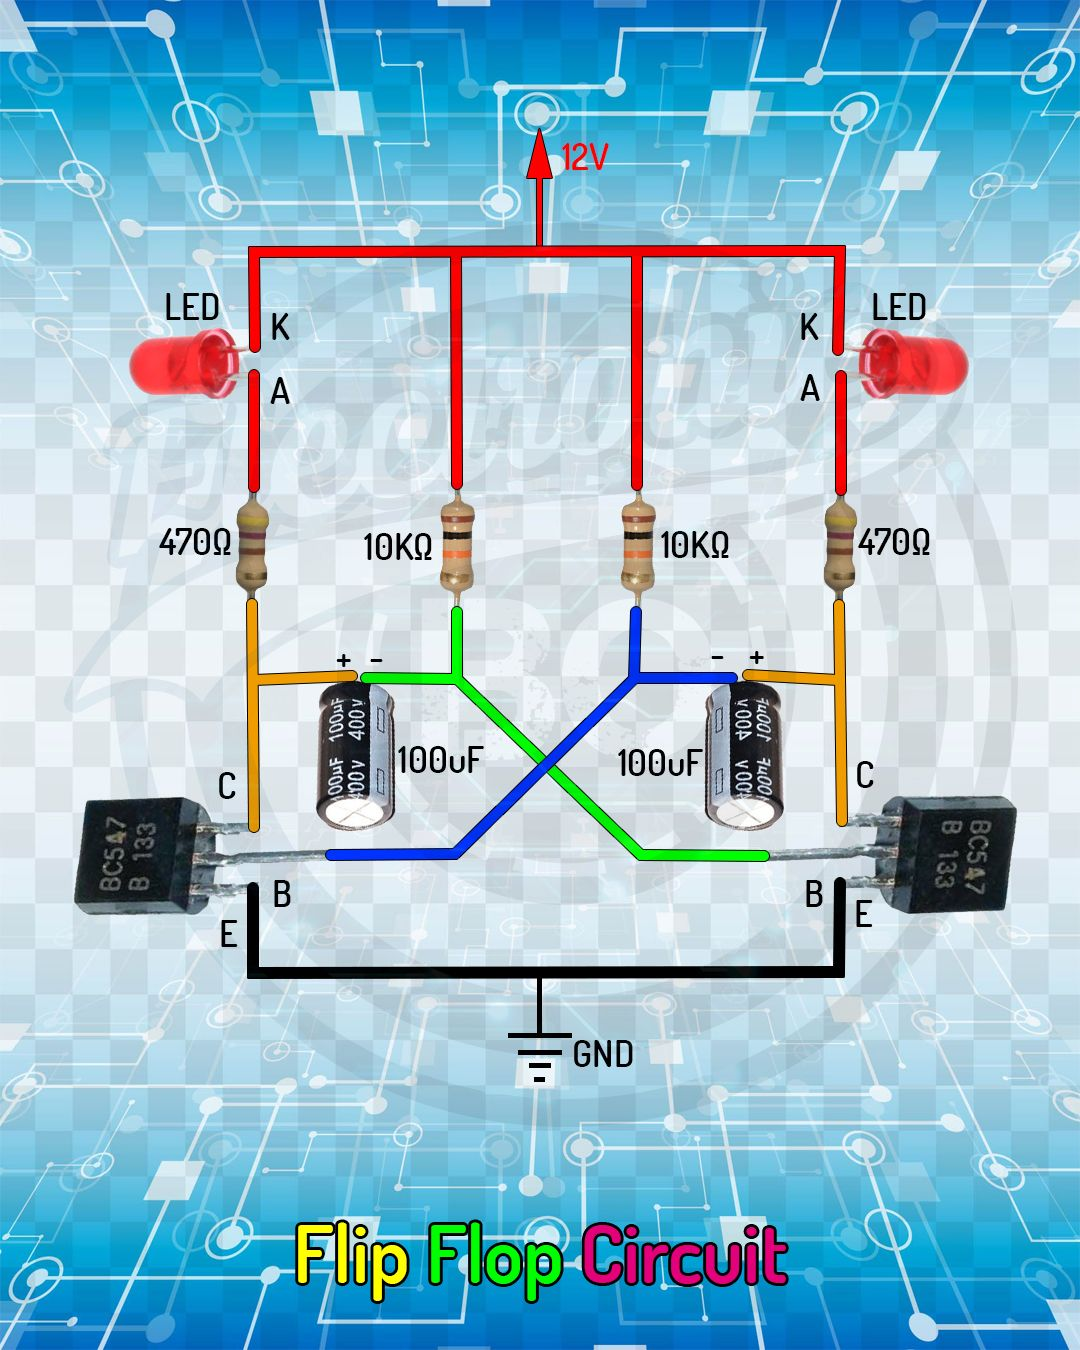 flip flop circuit  [ 1080 x 1350 Pixel ]